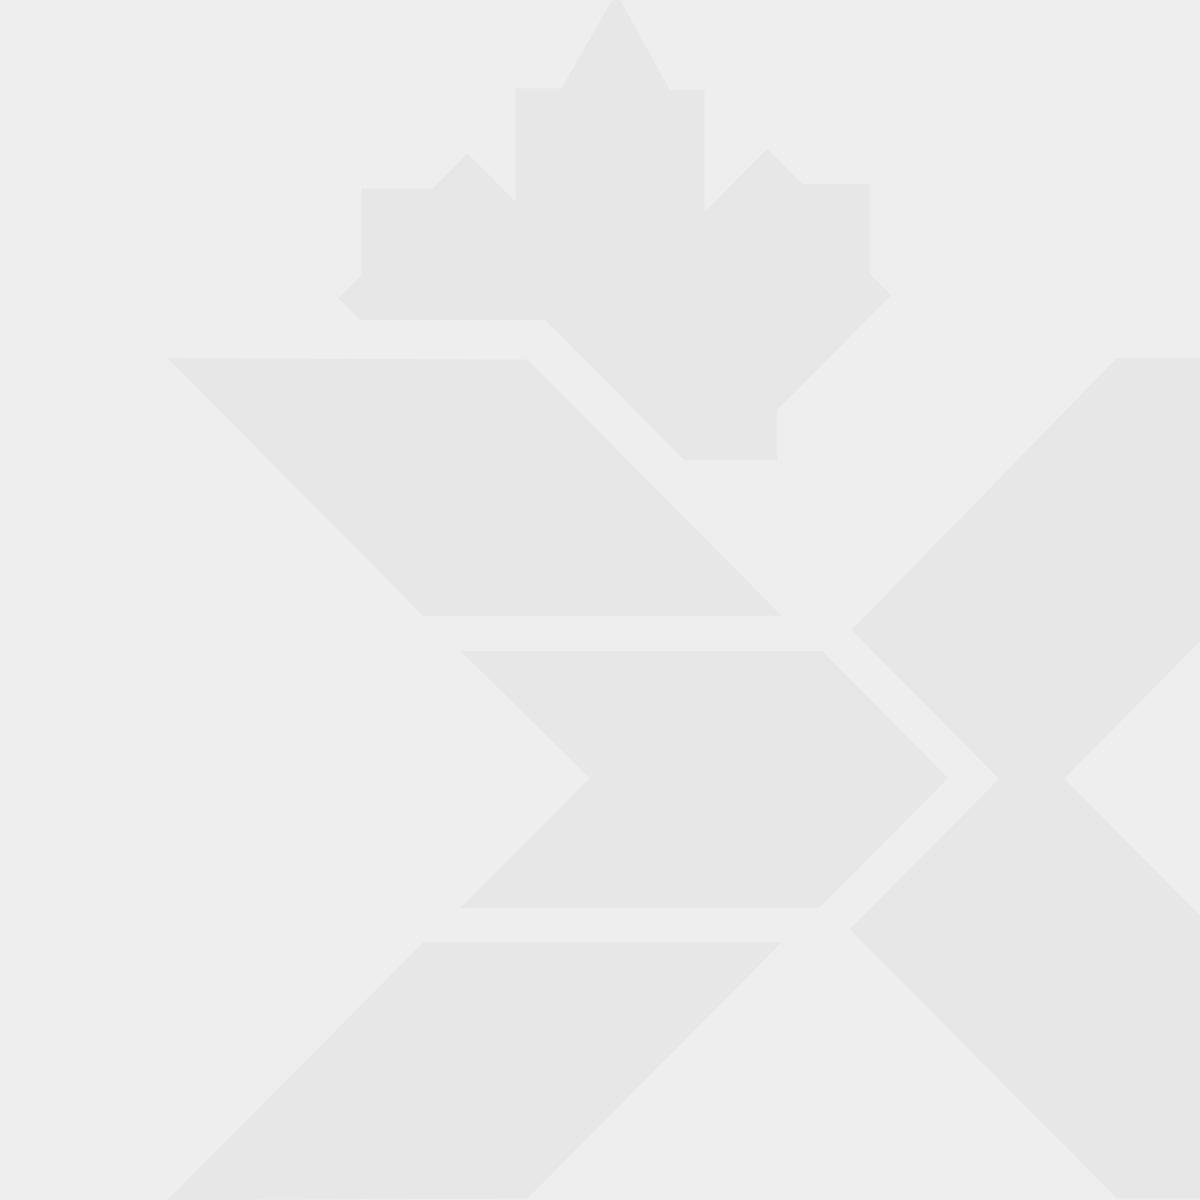 The Royal Canadian Legion Armistice 1918 Commemorative Pin